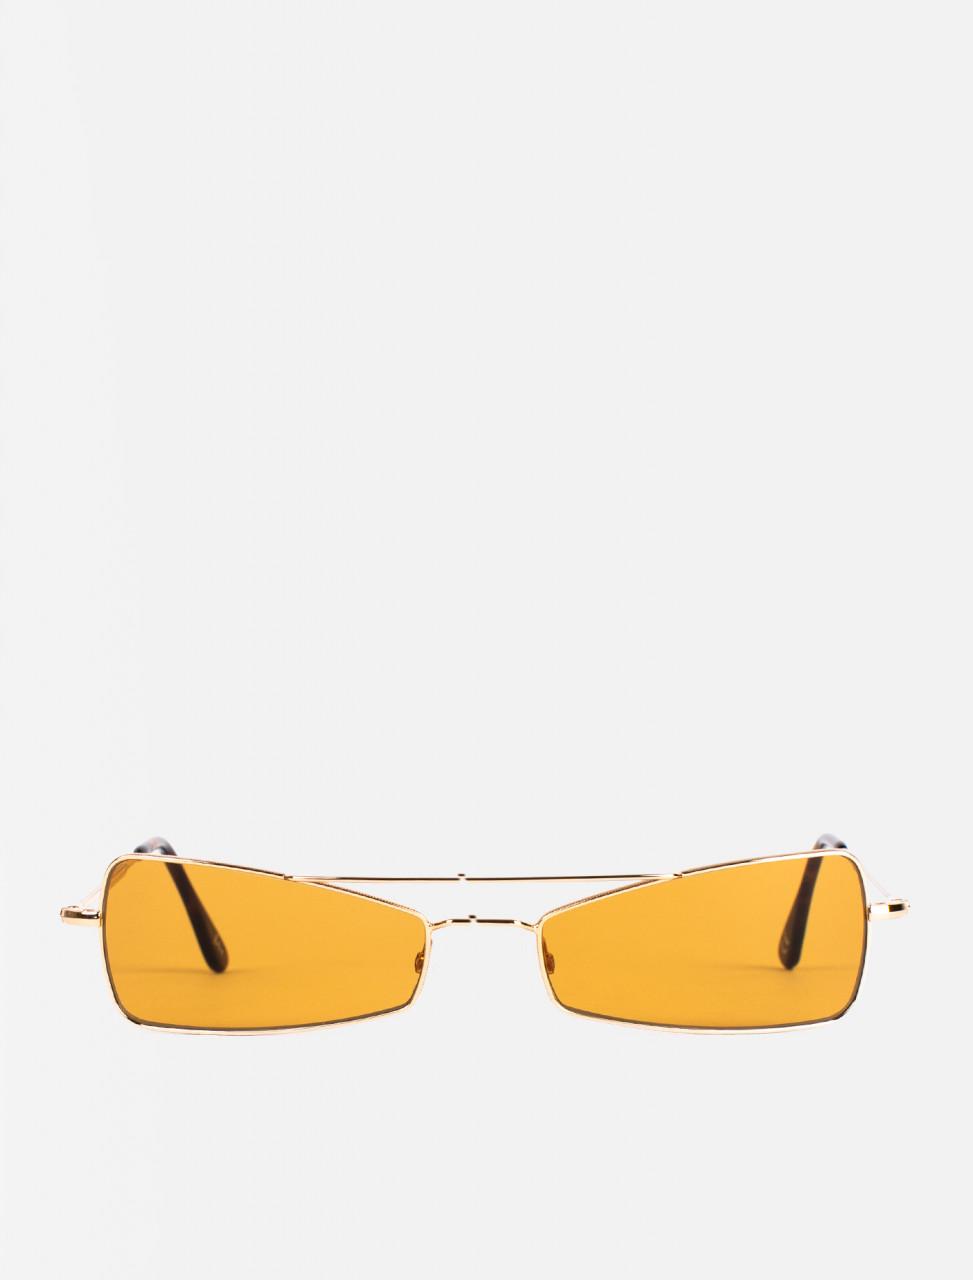 Kira Sunglasses